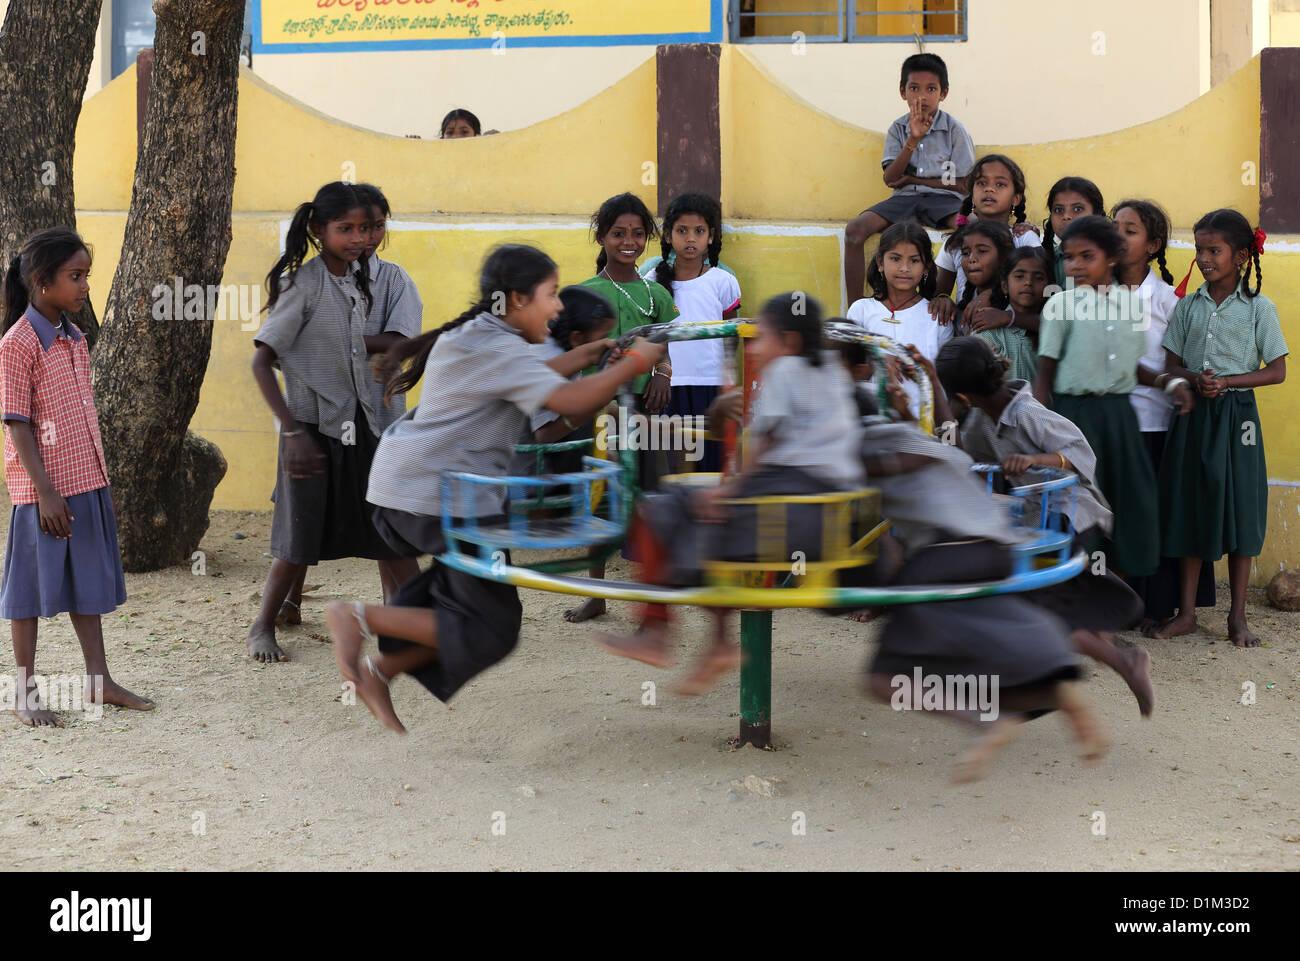 School children playing during school break Andhra Pradesh South India - Stock Image